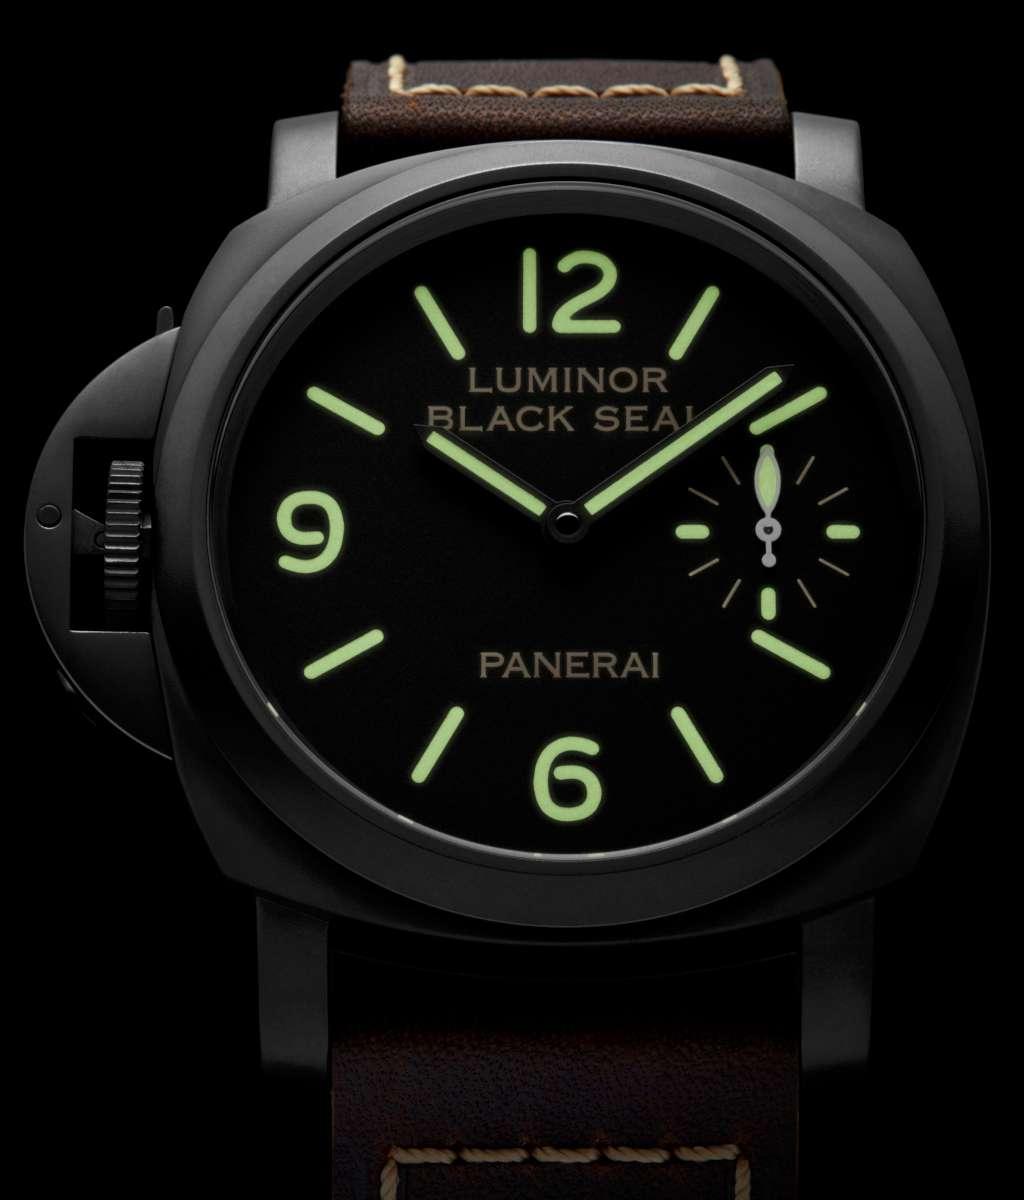 Panerai Luminor Black Seal Left-Handed 8 Days